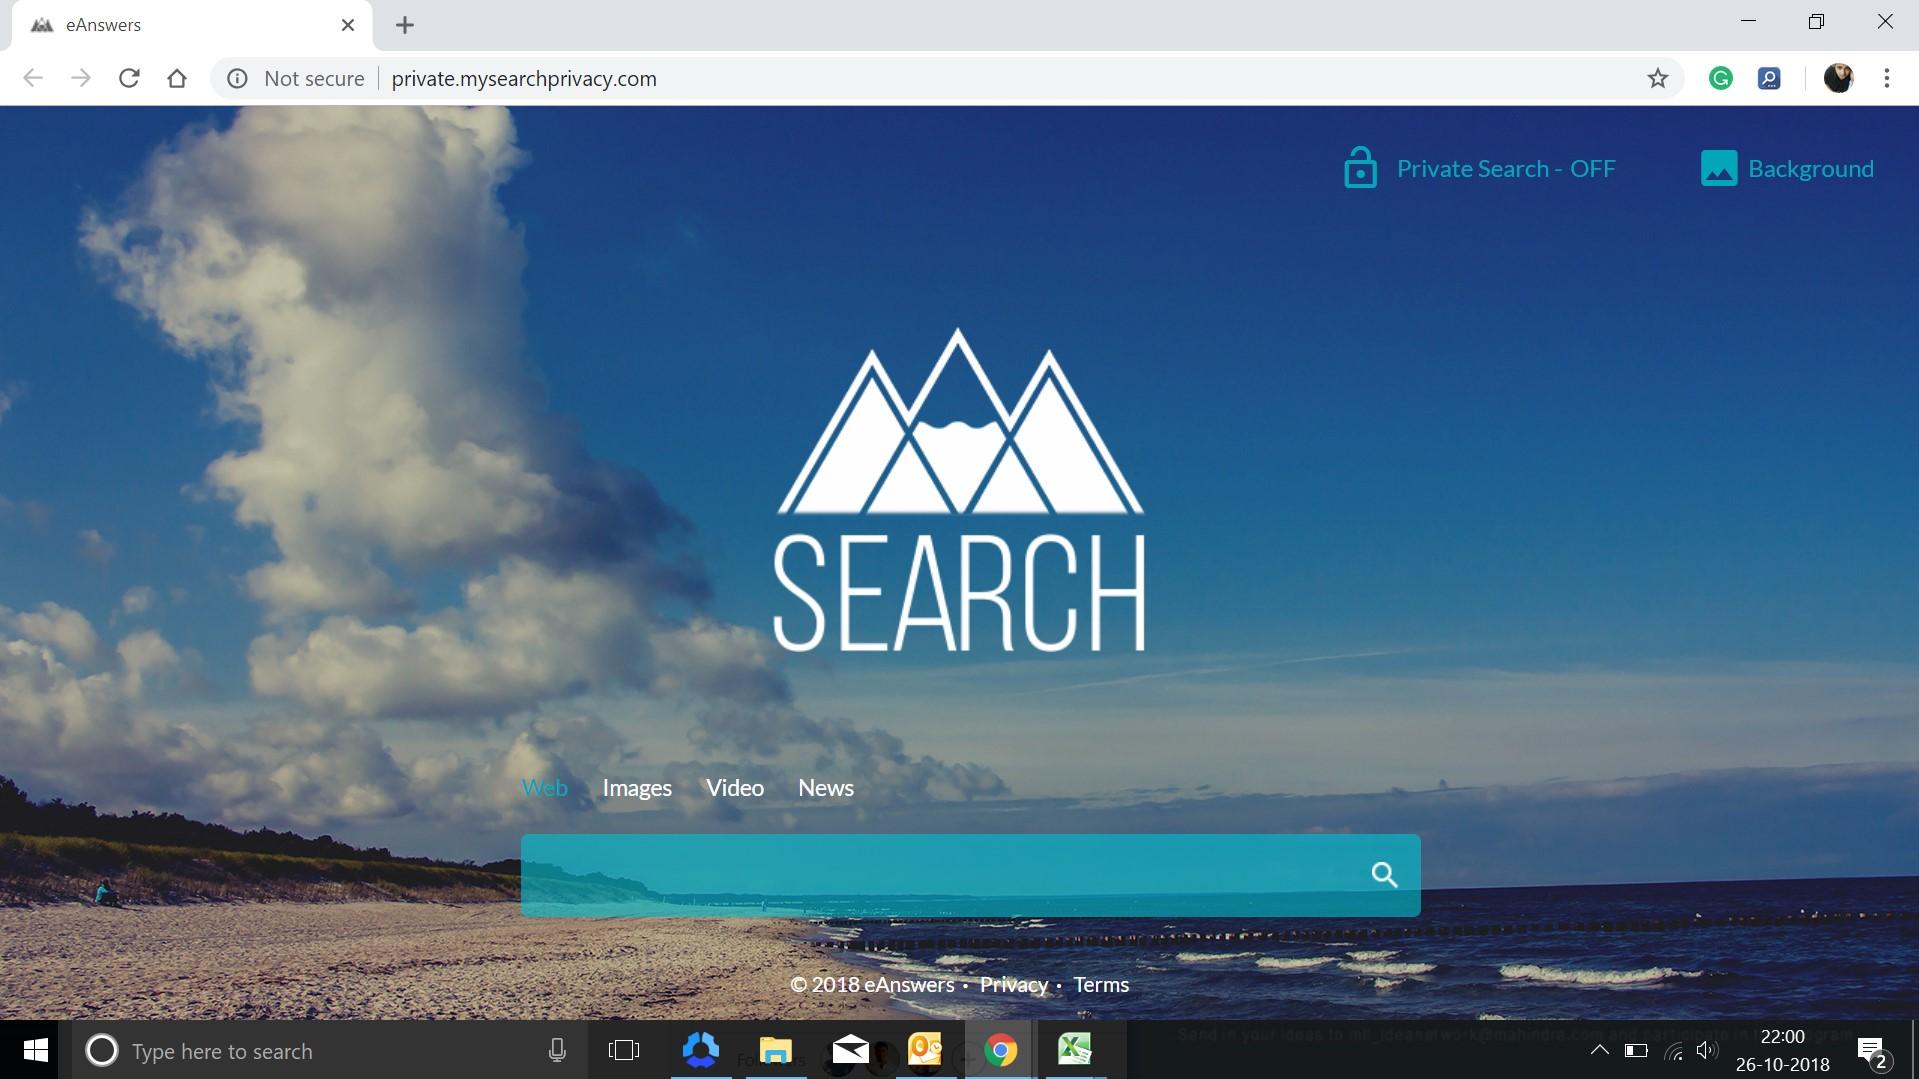 How to remove Private.mysearchprivacy.com Hijacker